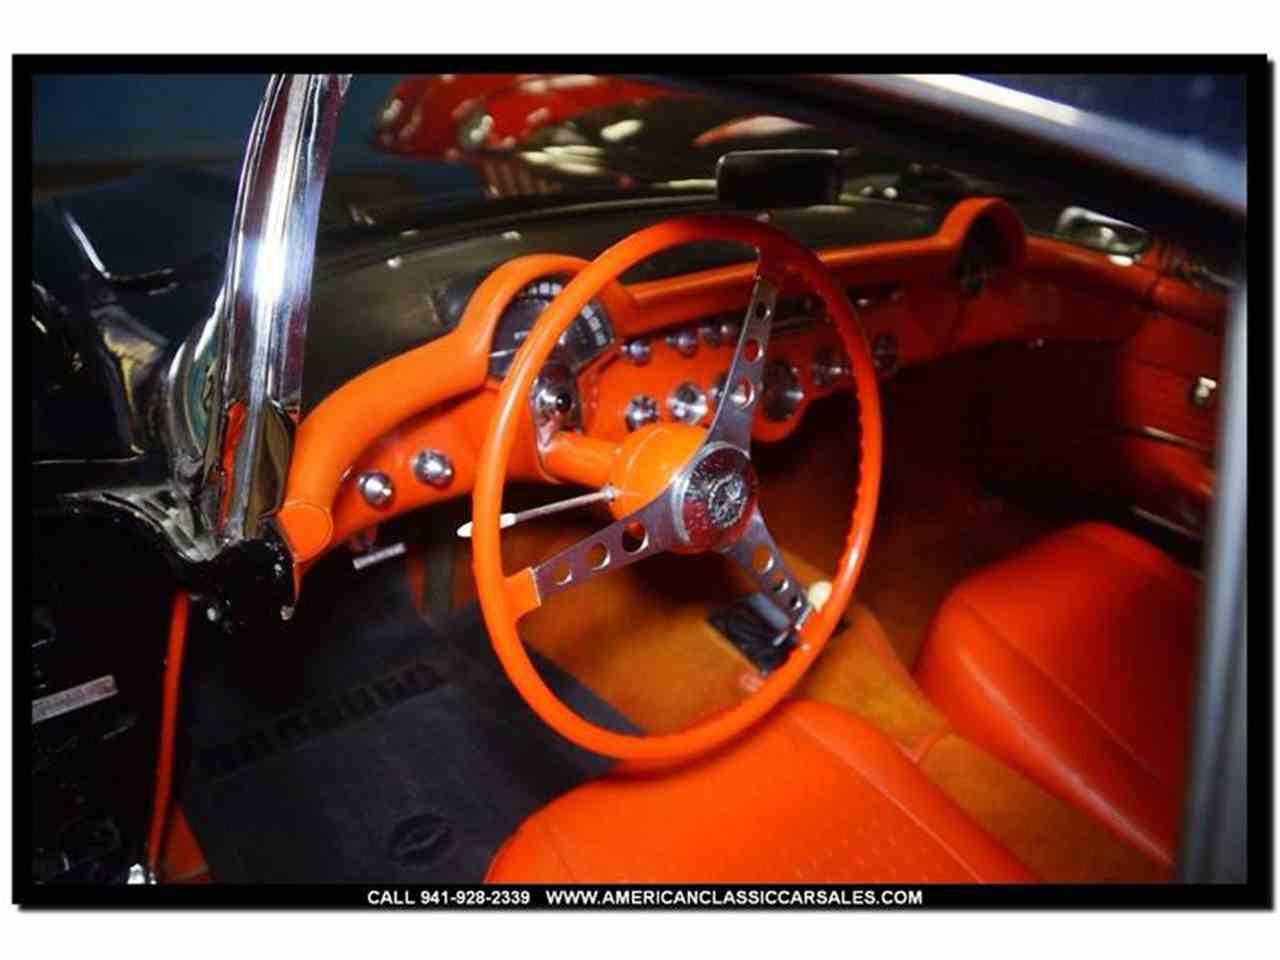 1957 chevrolet corvette for sale on classiccars com 31 - Photo 18